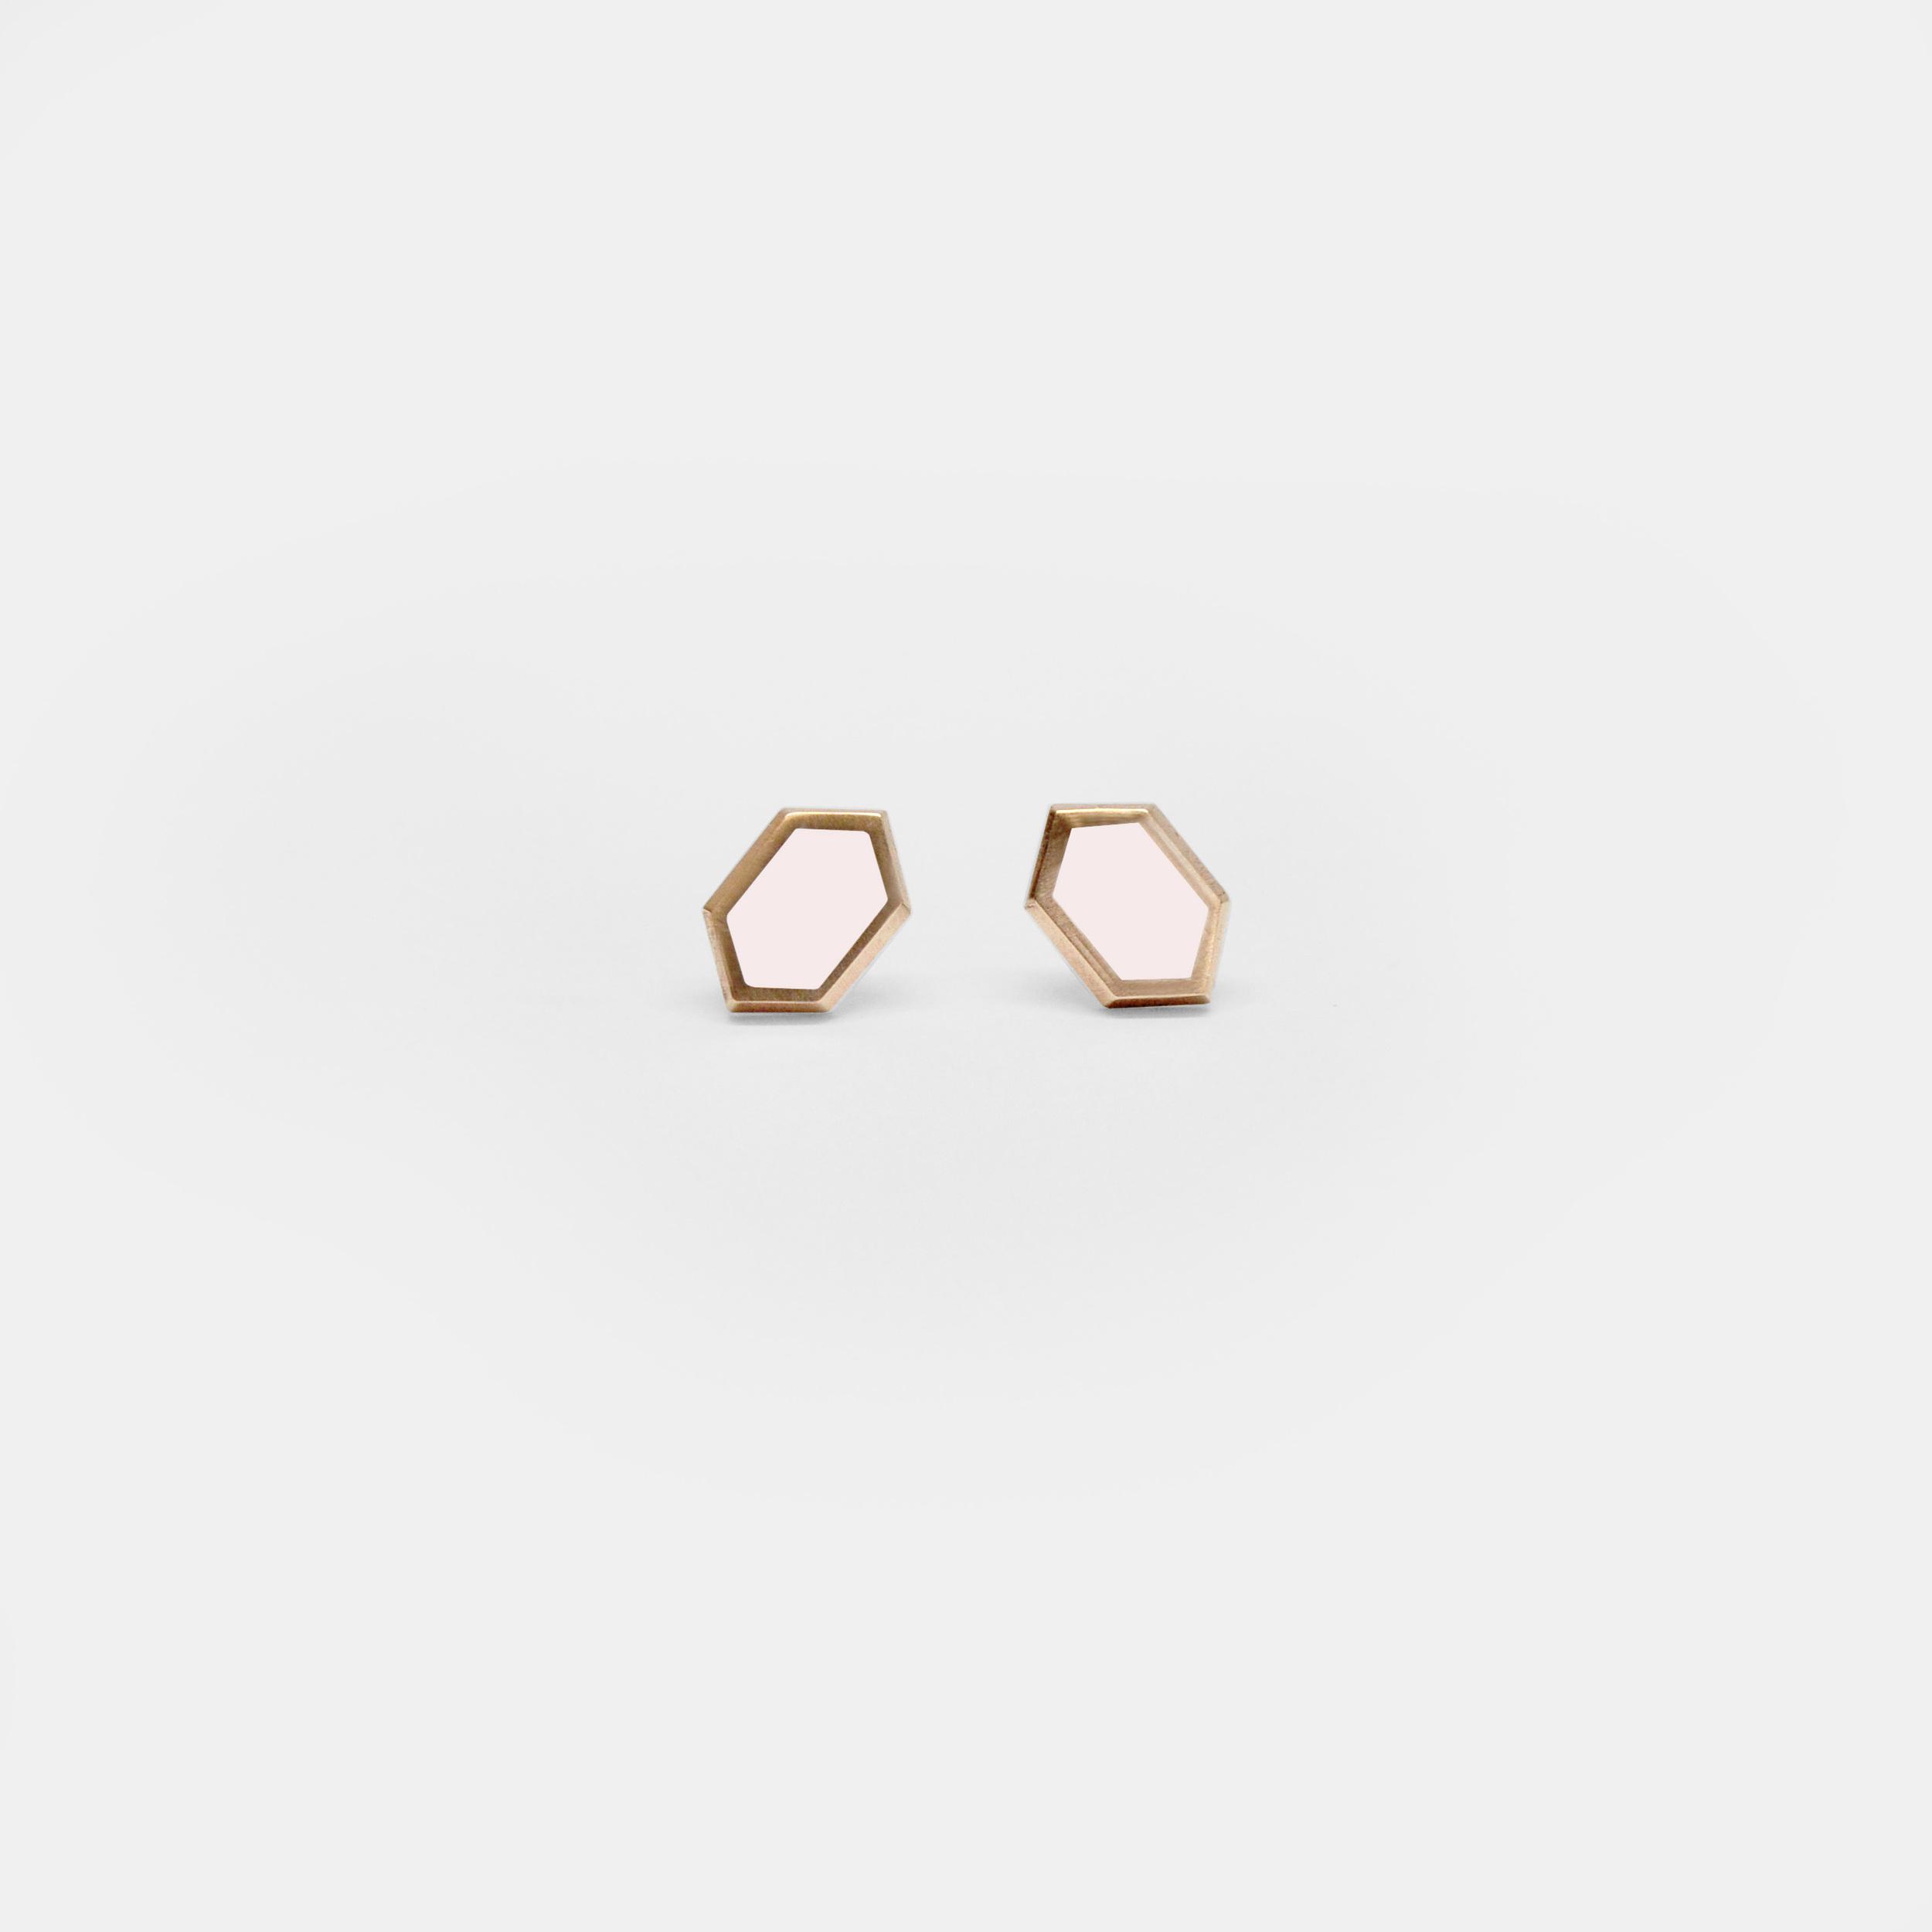 Marisa Lomonaco Jewelry - Hudson Valley Custom Jewelry